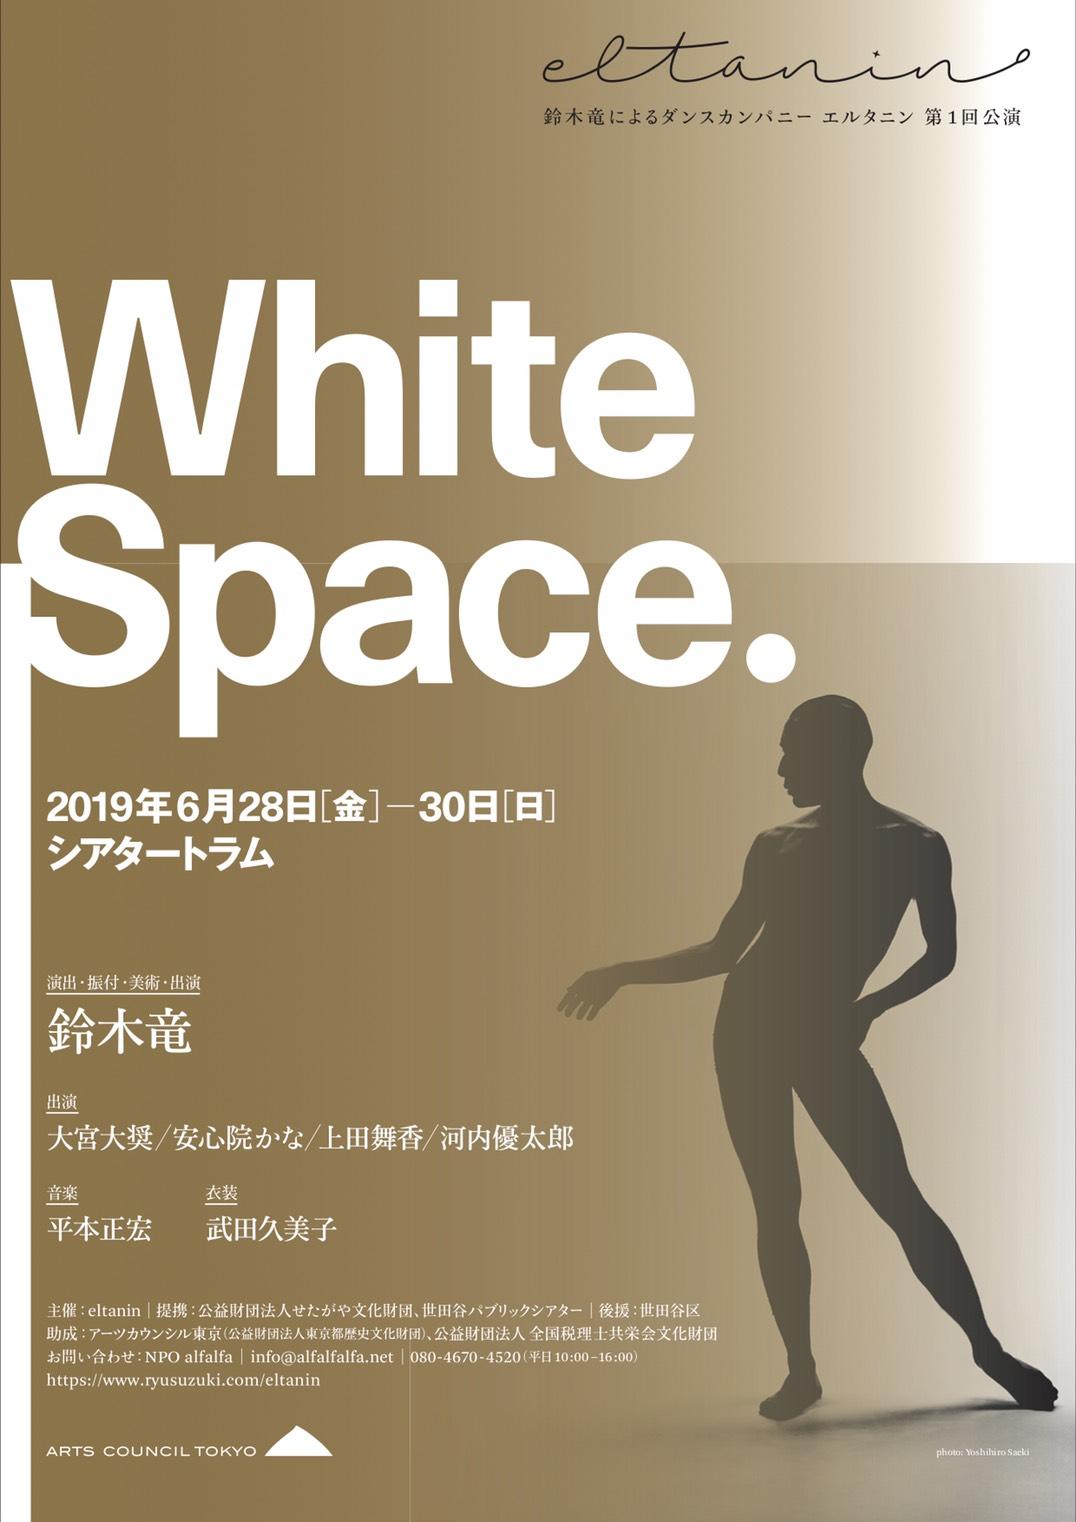 eltanin White Space. チラシ表